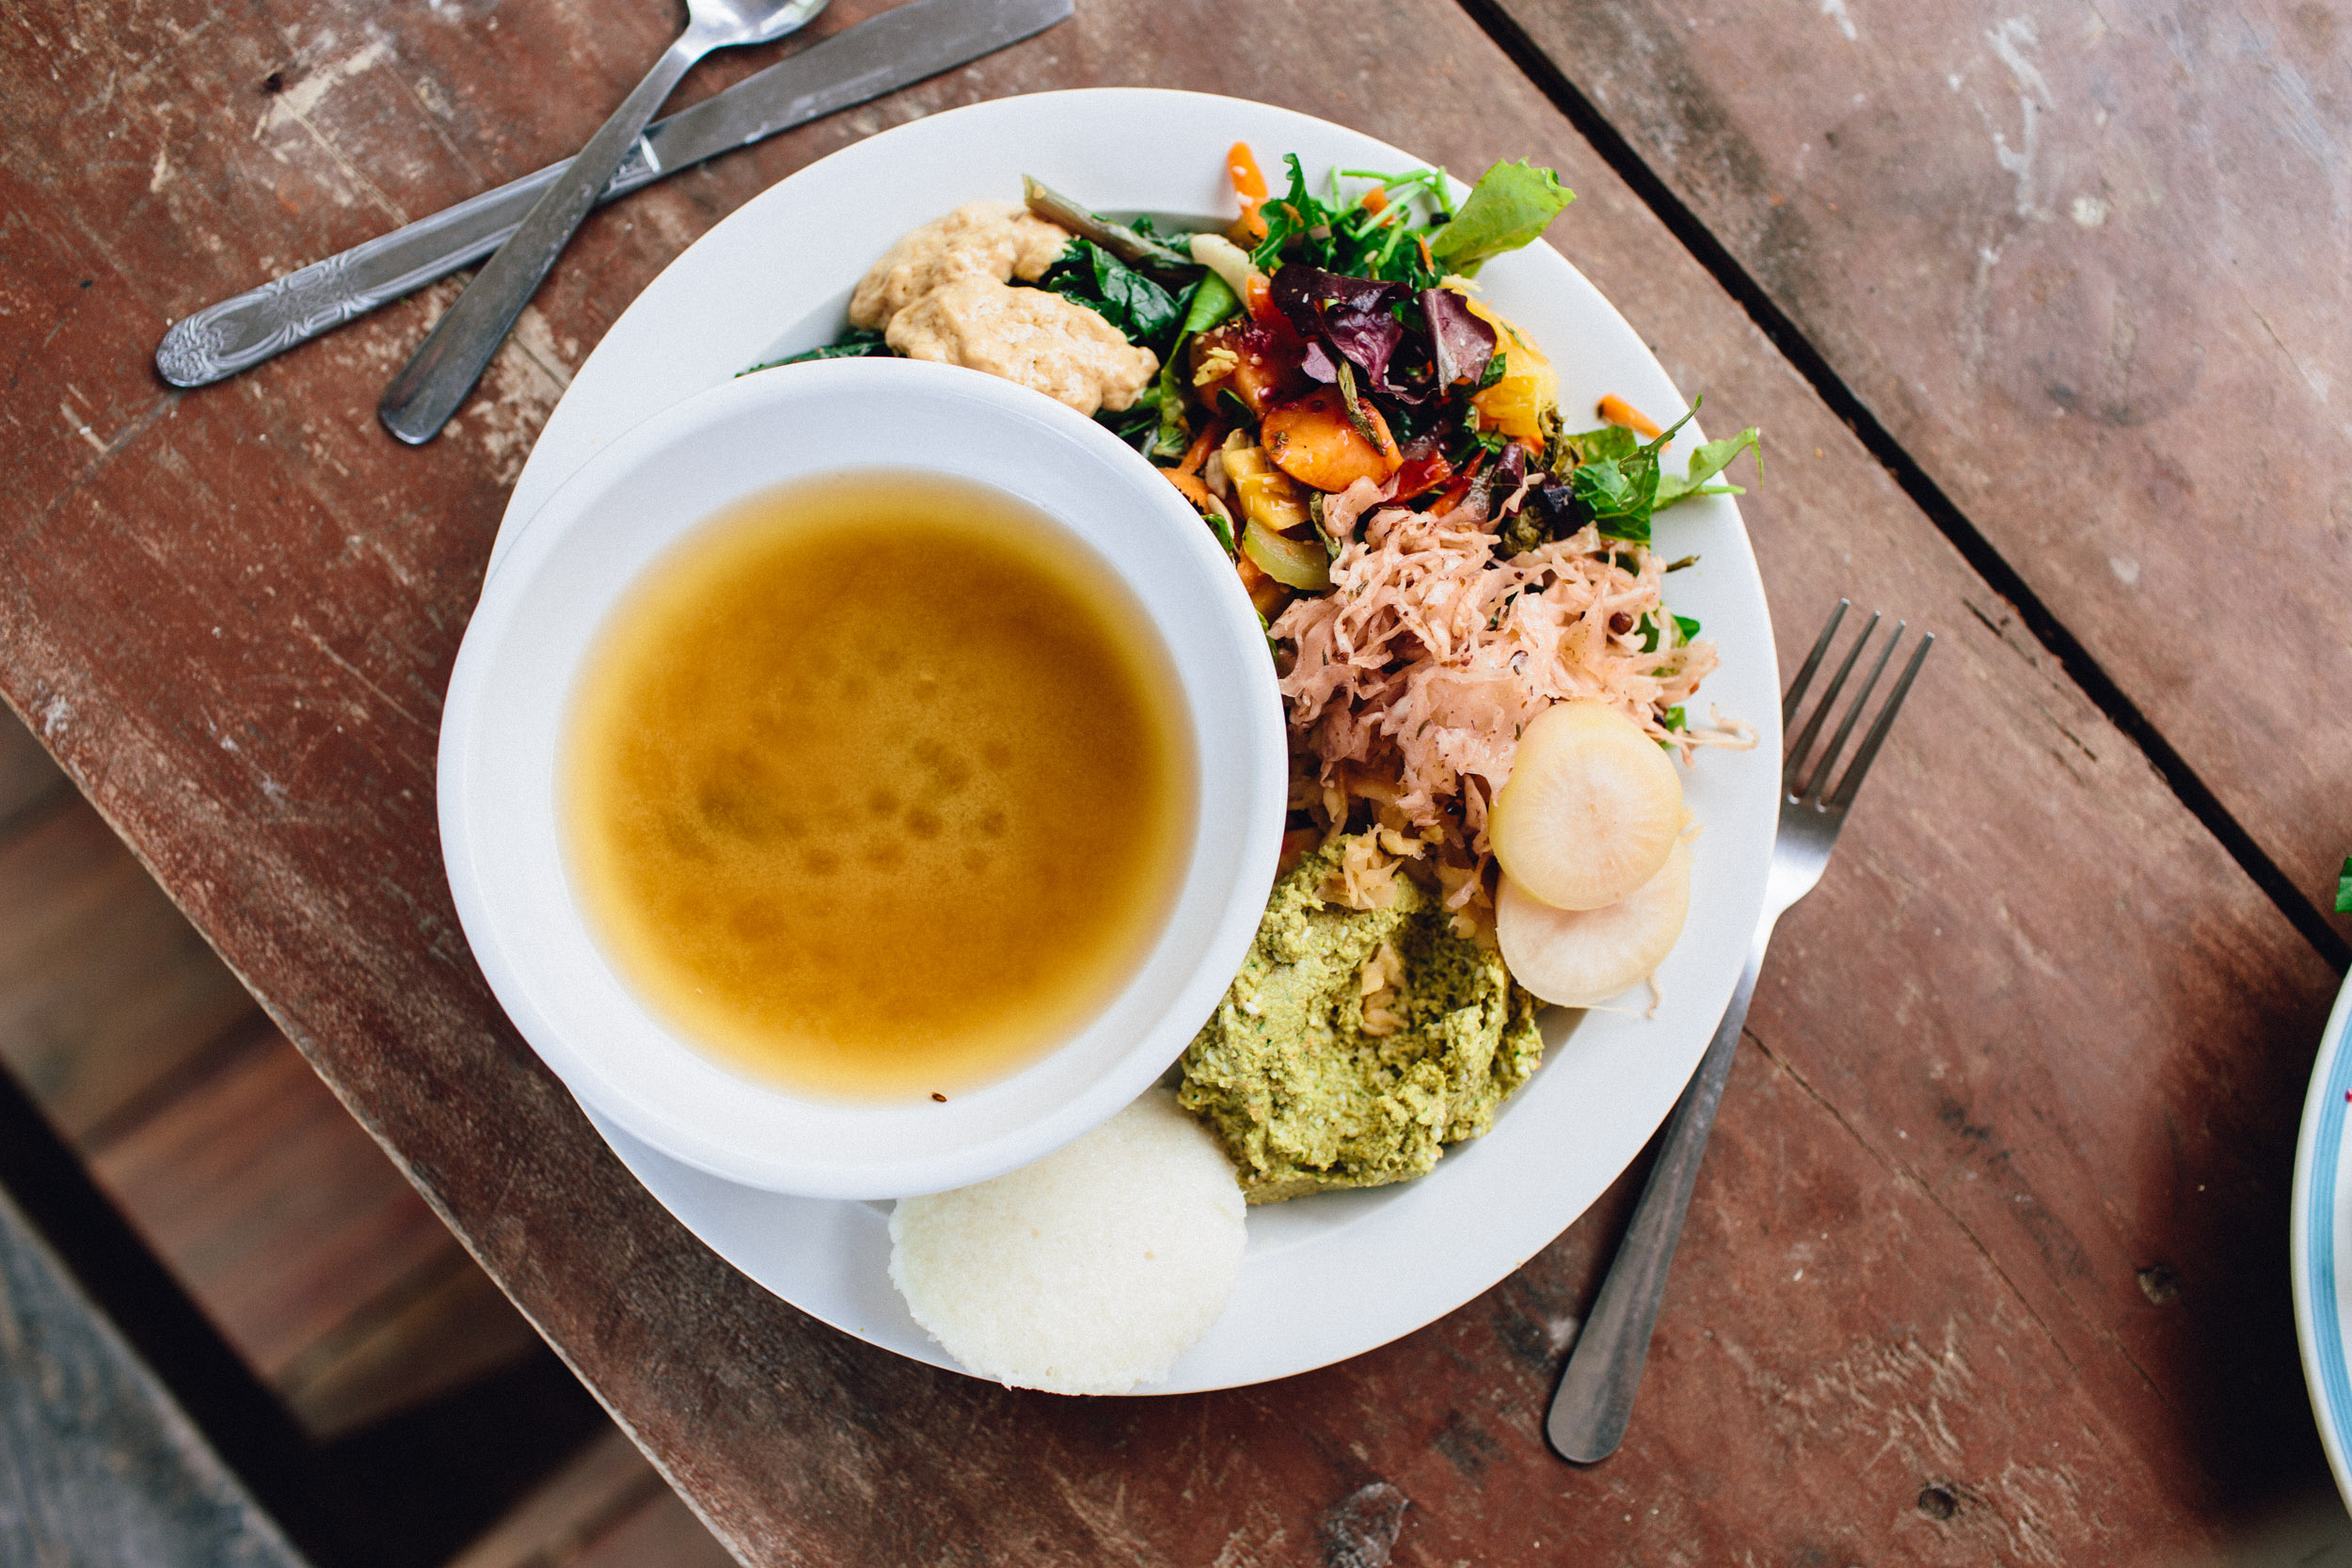 Sandor made us Miso soup for lunch. Also on the plate: idli, nut & veggie paté, garden salad, sautéed greens, and sauerkraut.